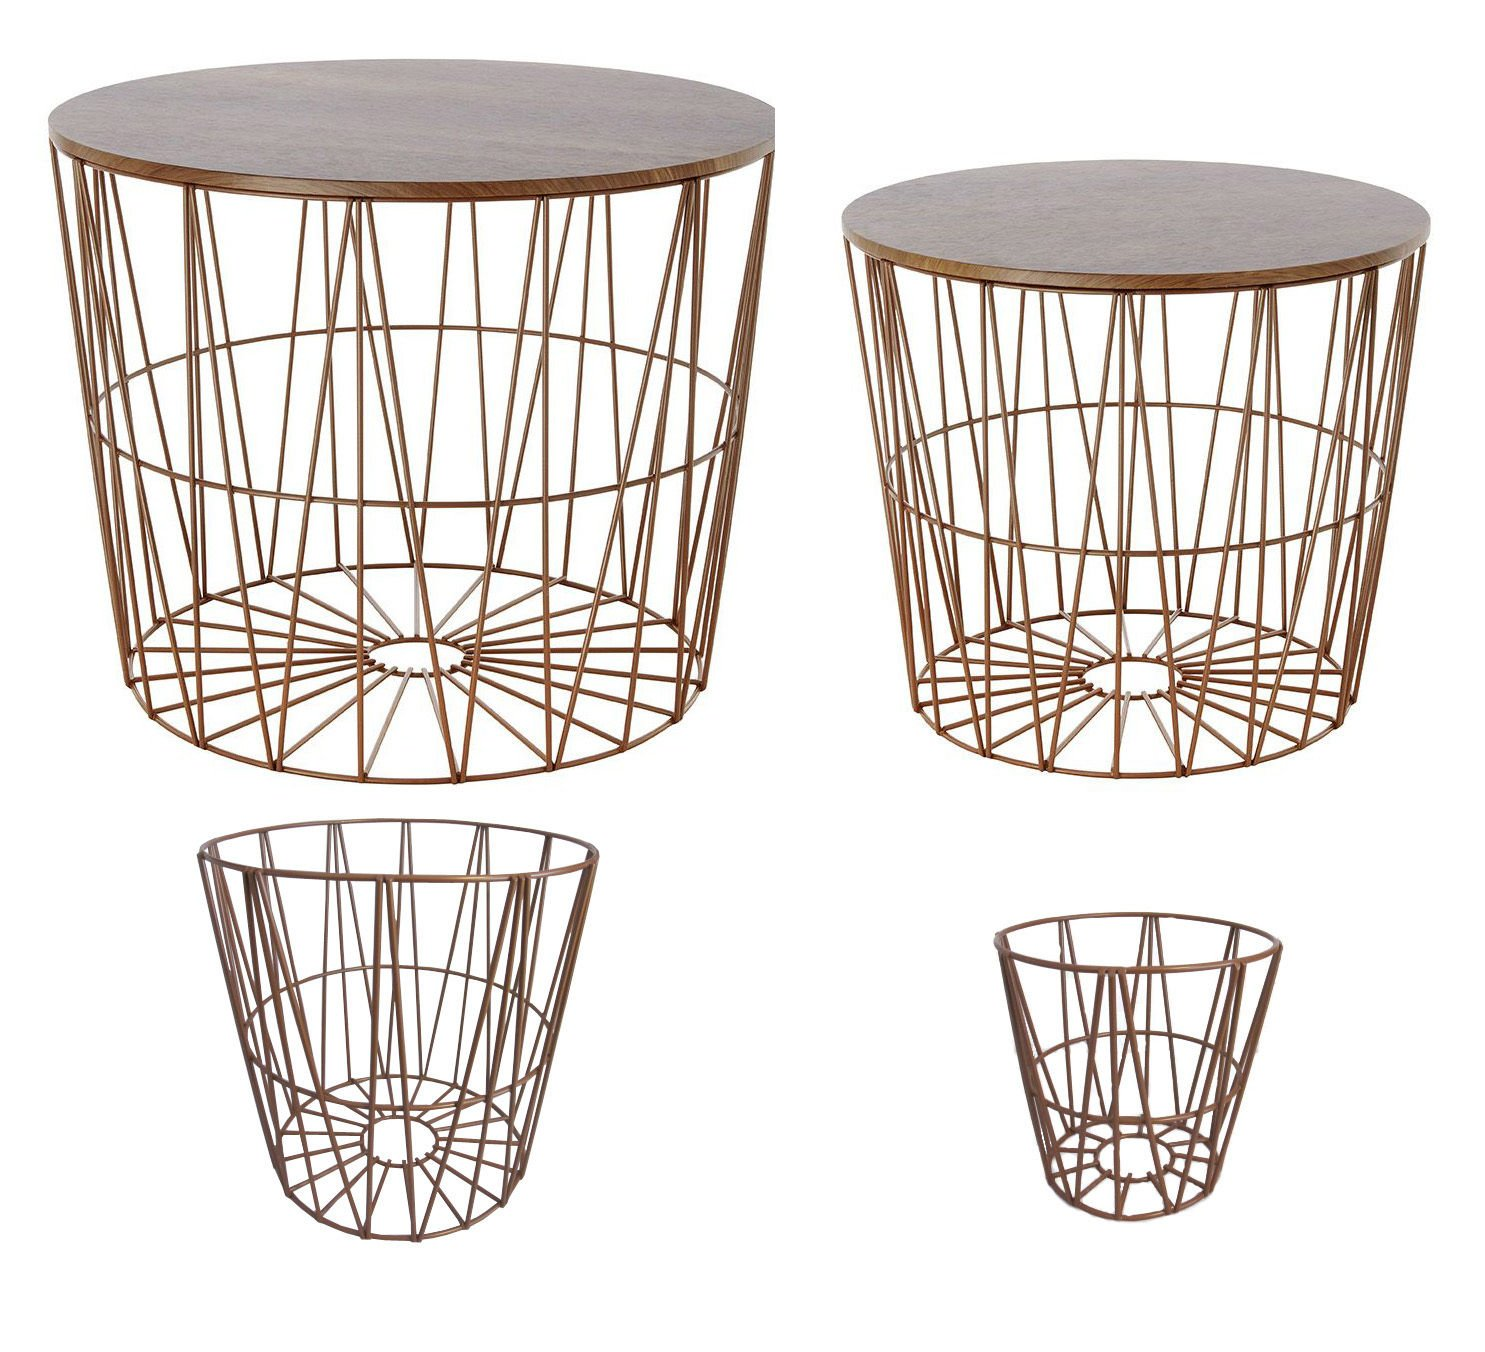 beistelltisch metall draht wei. Black Bedroom Furniture Sets. Home Design Ideas